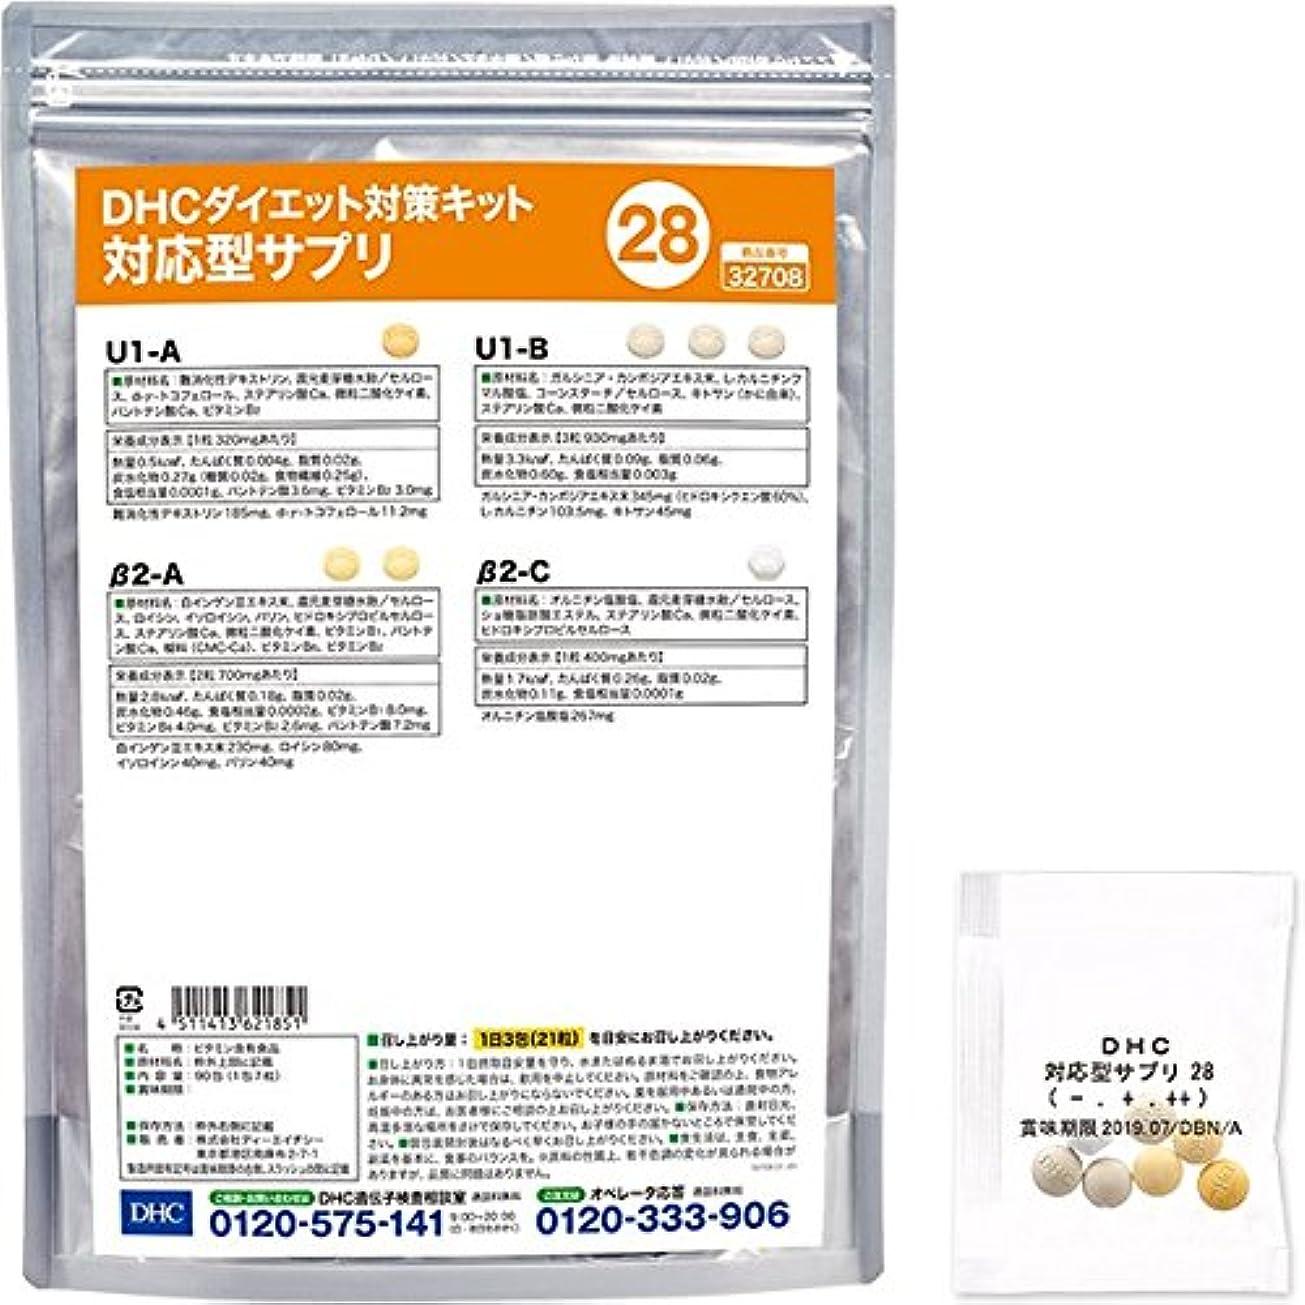 DHCダイエット対策キット対応型サプリ28